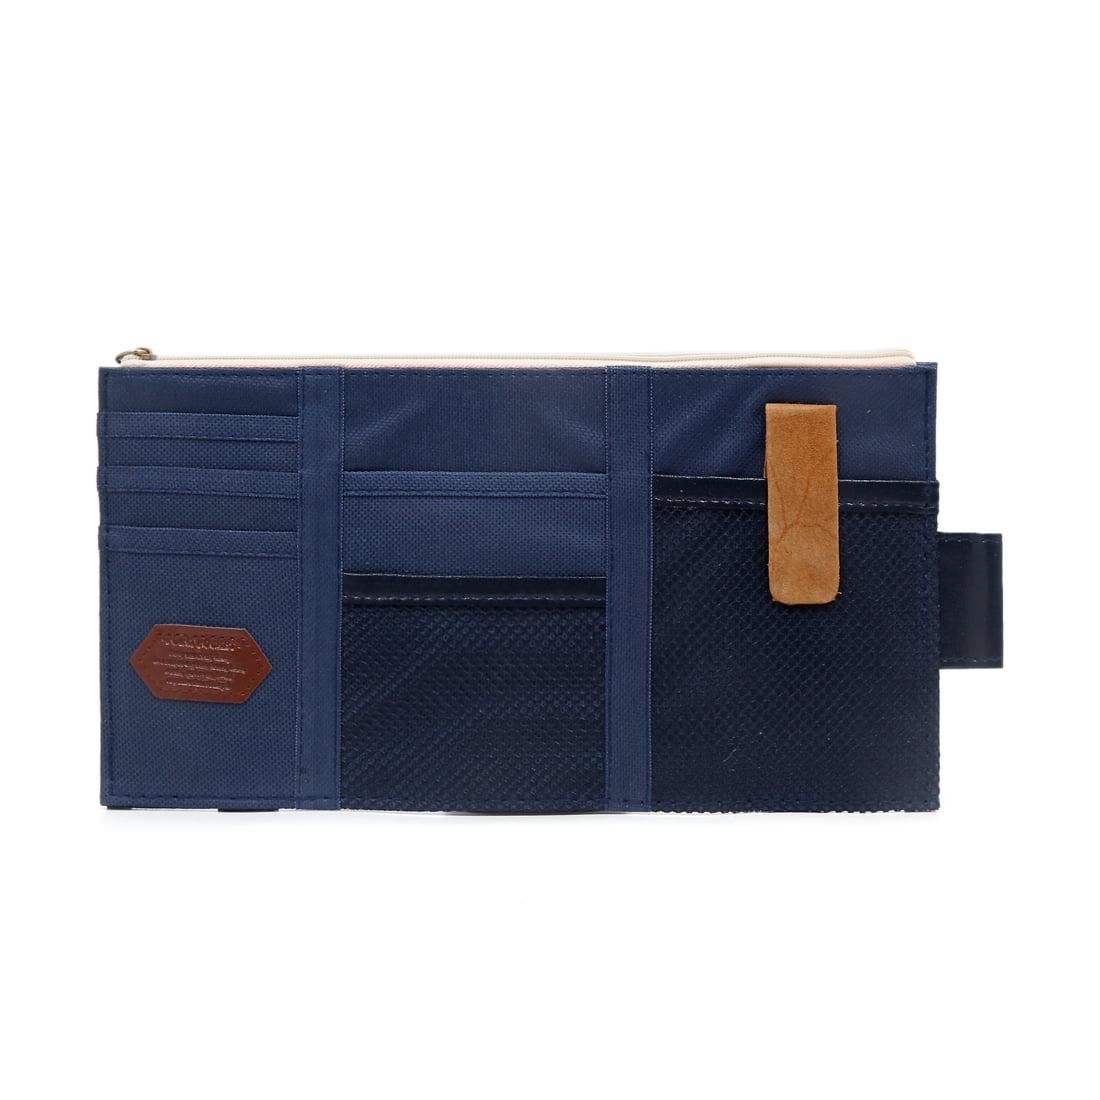 Auto Car Sun Visor Multi Pockets Organizer Storage Bag Card Holder Pouch Bag